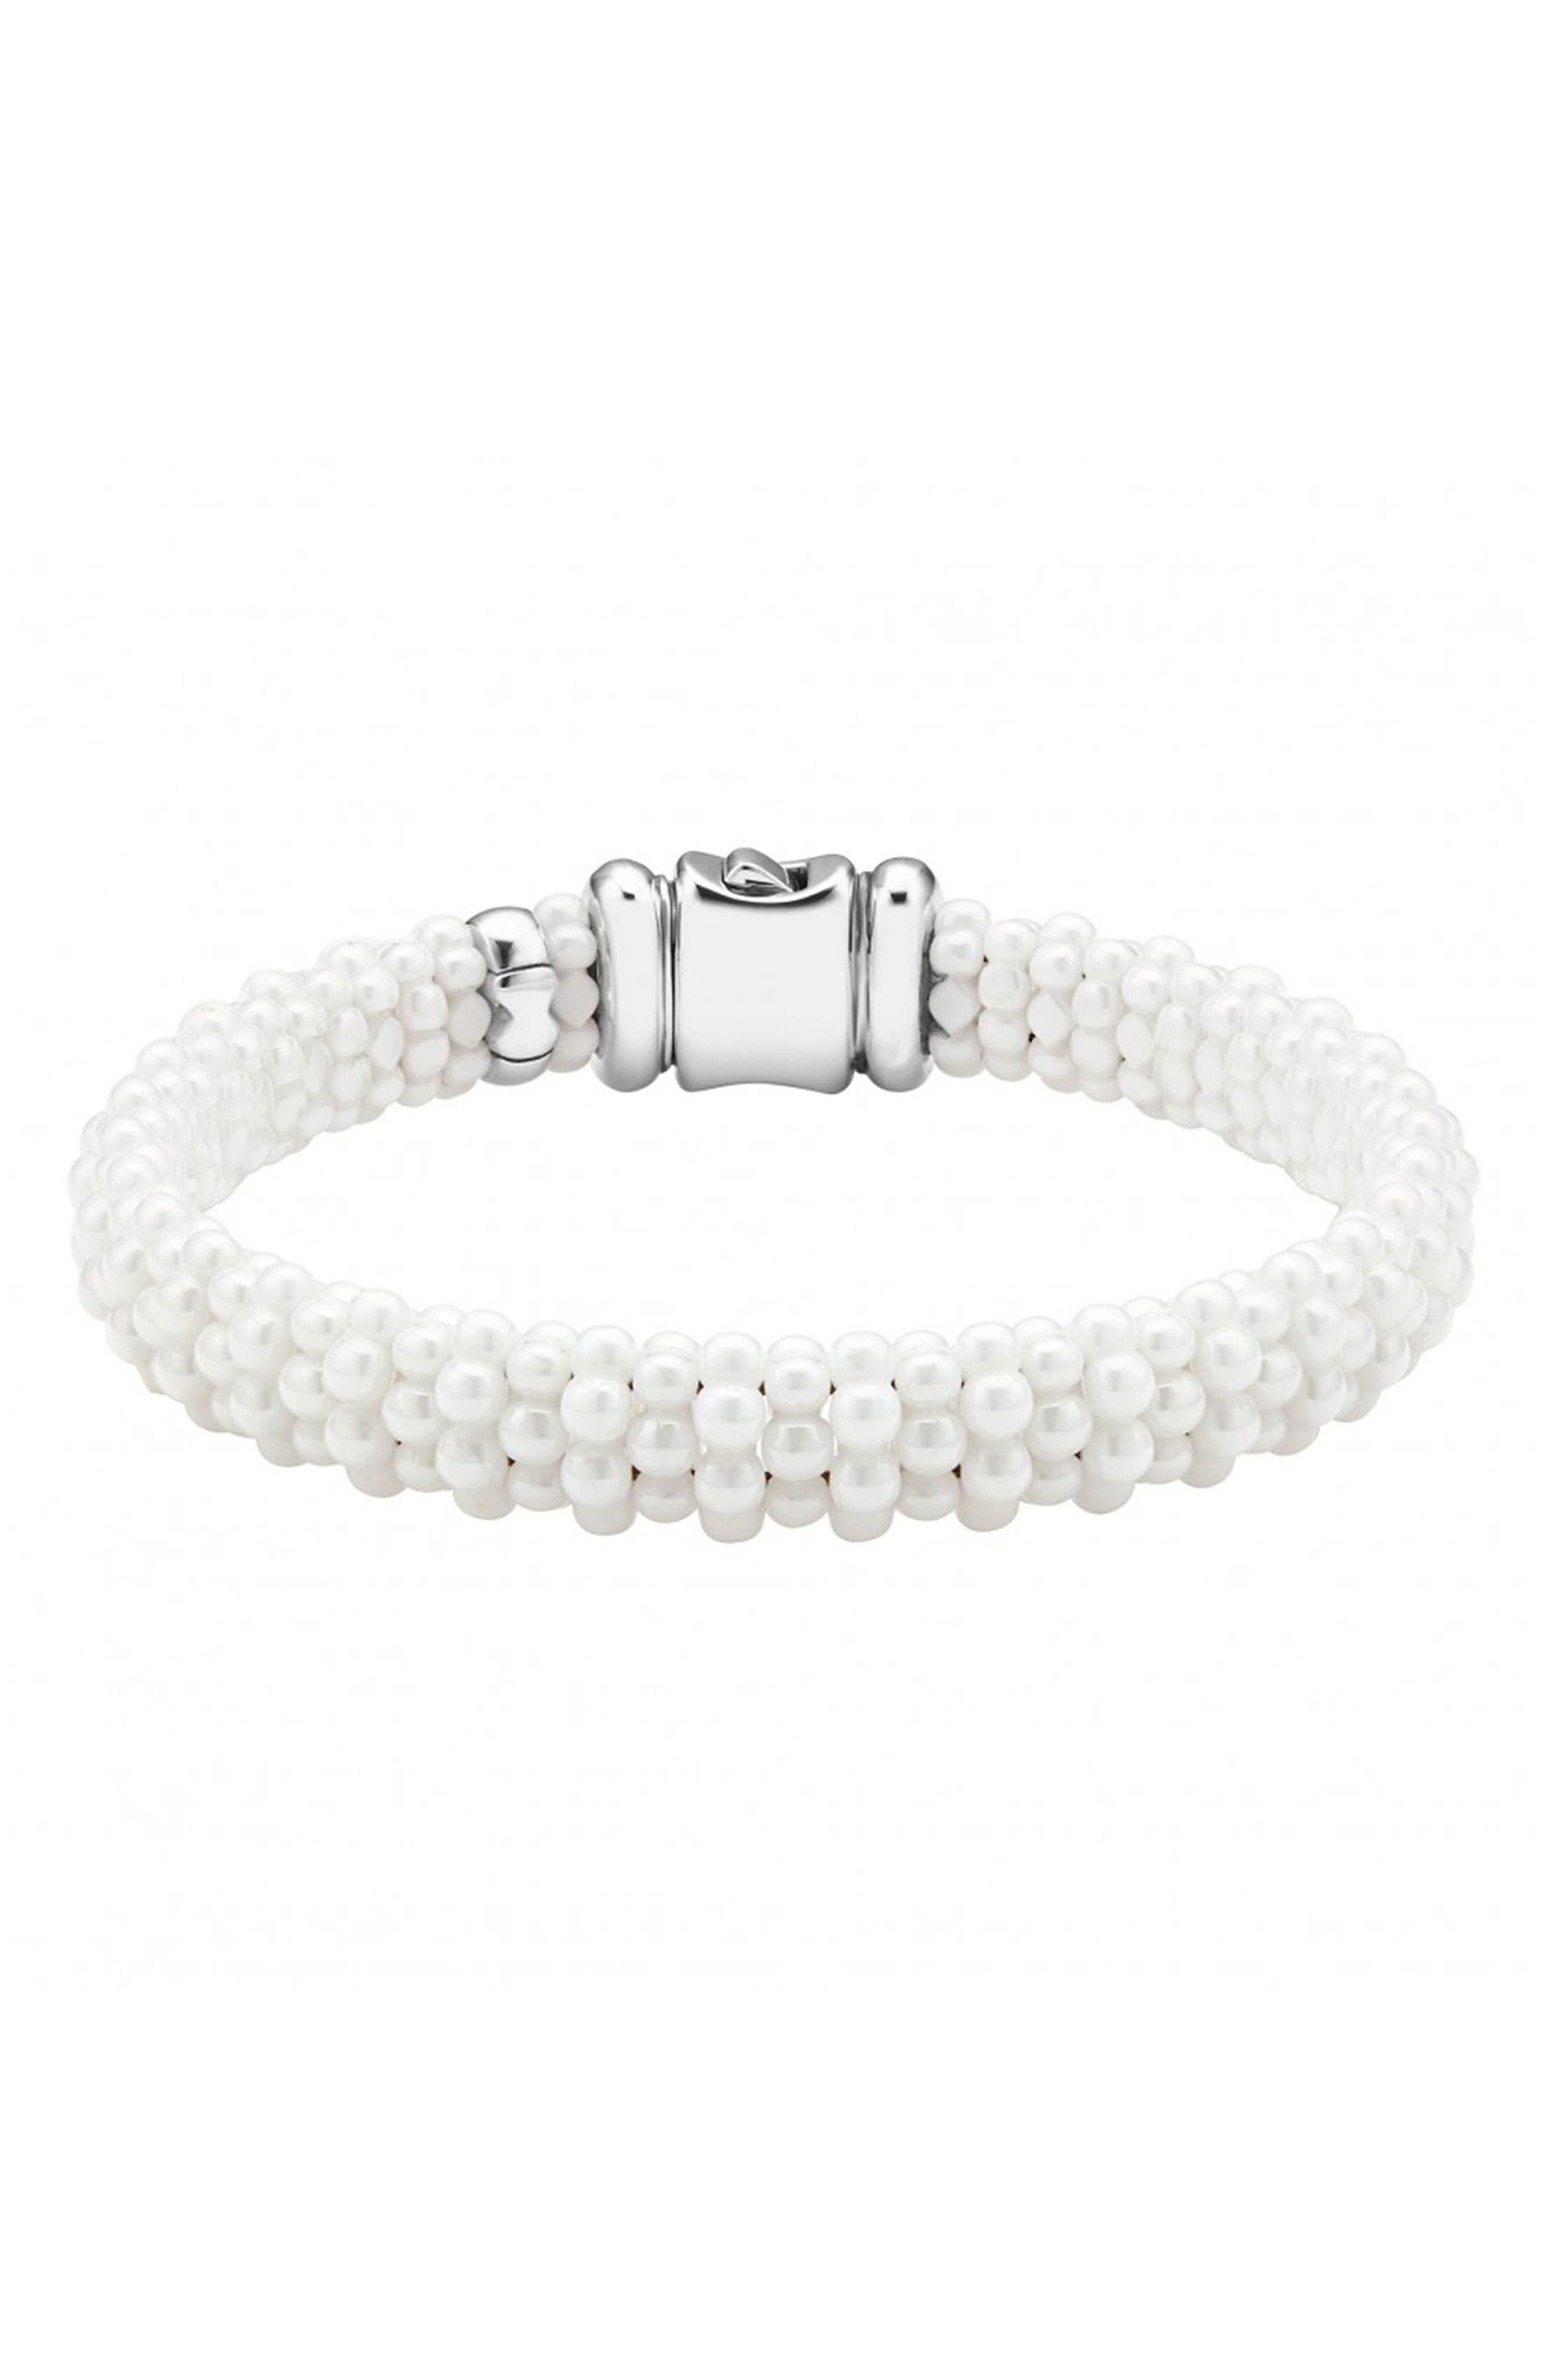 'White Caviar' Rope Bracelet,                             Alternate thumbnail 2, color,                             WHITE CAVIAR